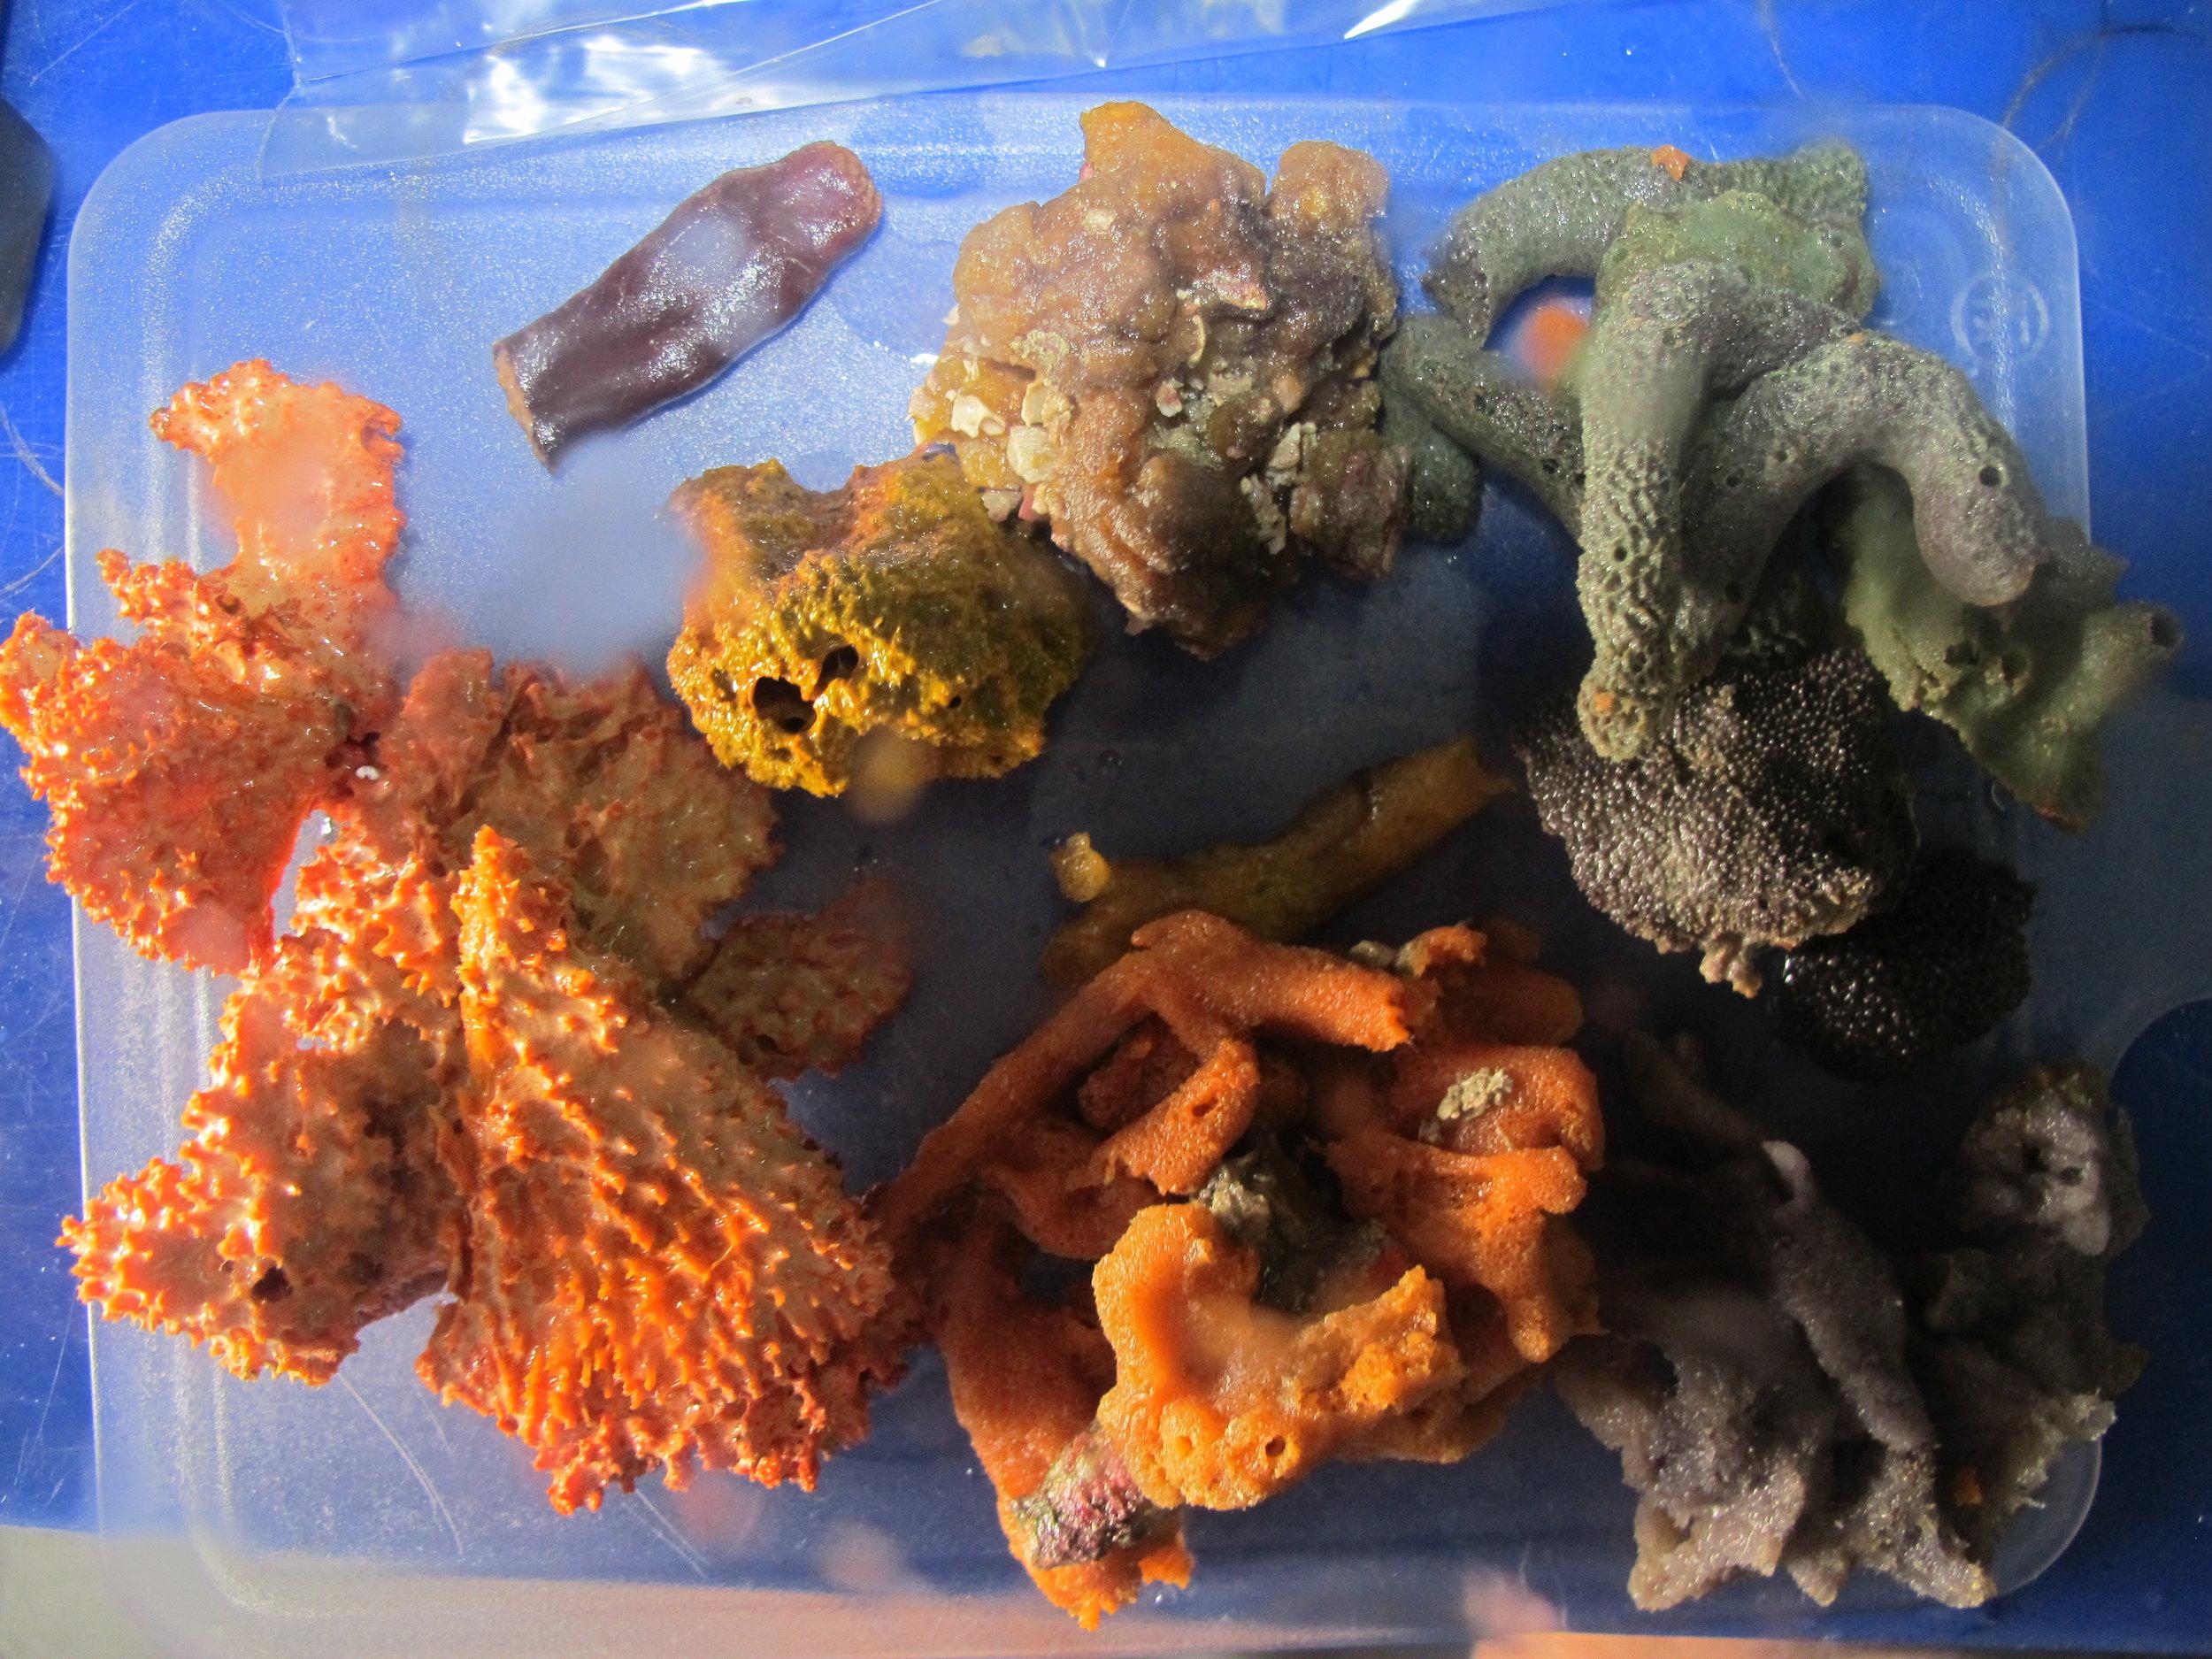 Burmese sponges